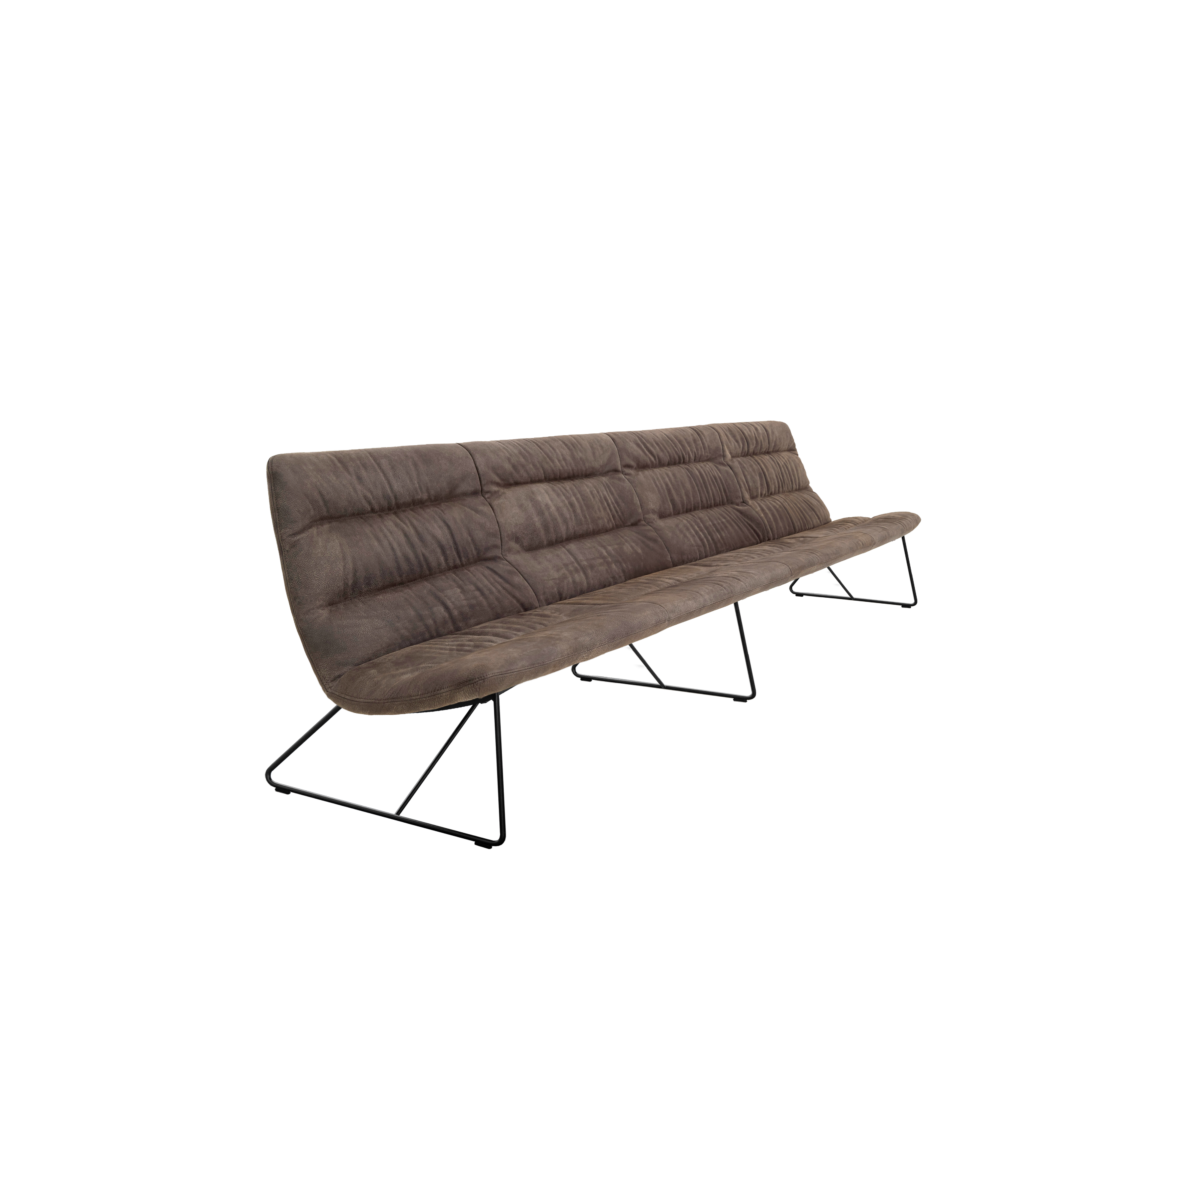 ARVA LIGHT LOUNGE 4er bench kuf oA pol KFF  2 1200x1200 - Bancheta Arva Light KFF